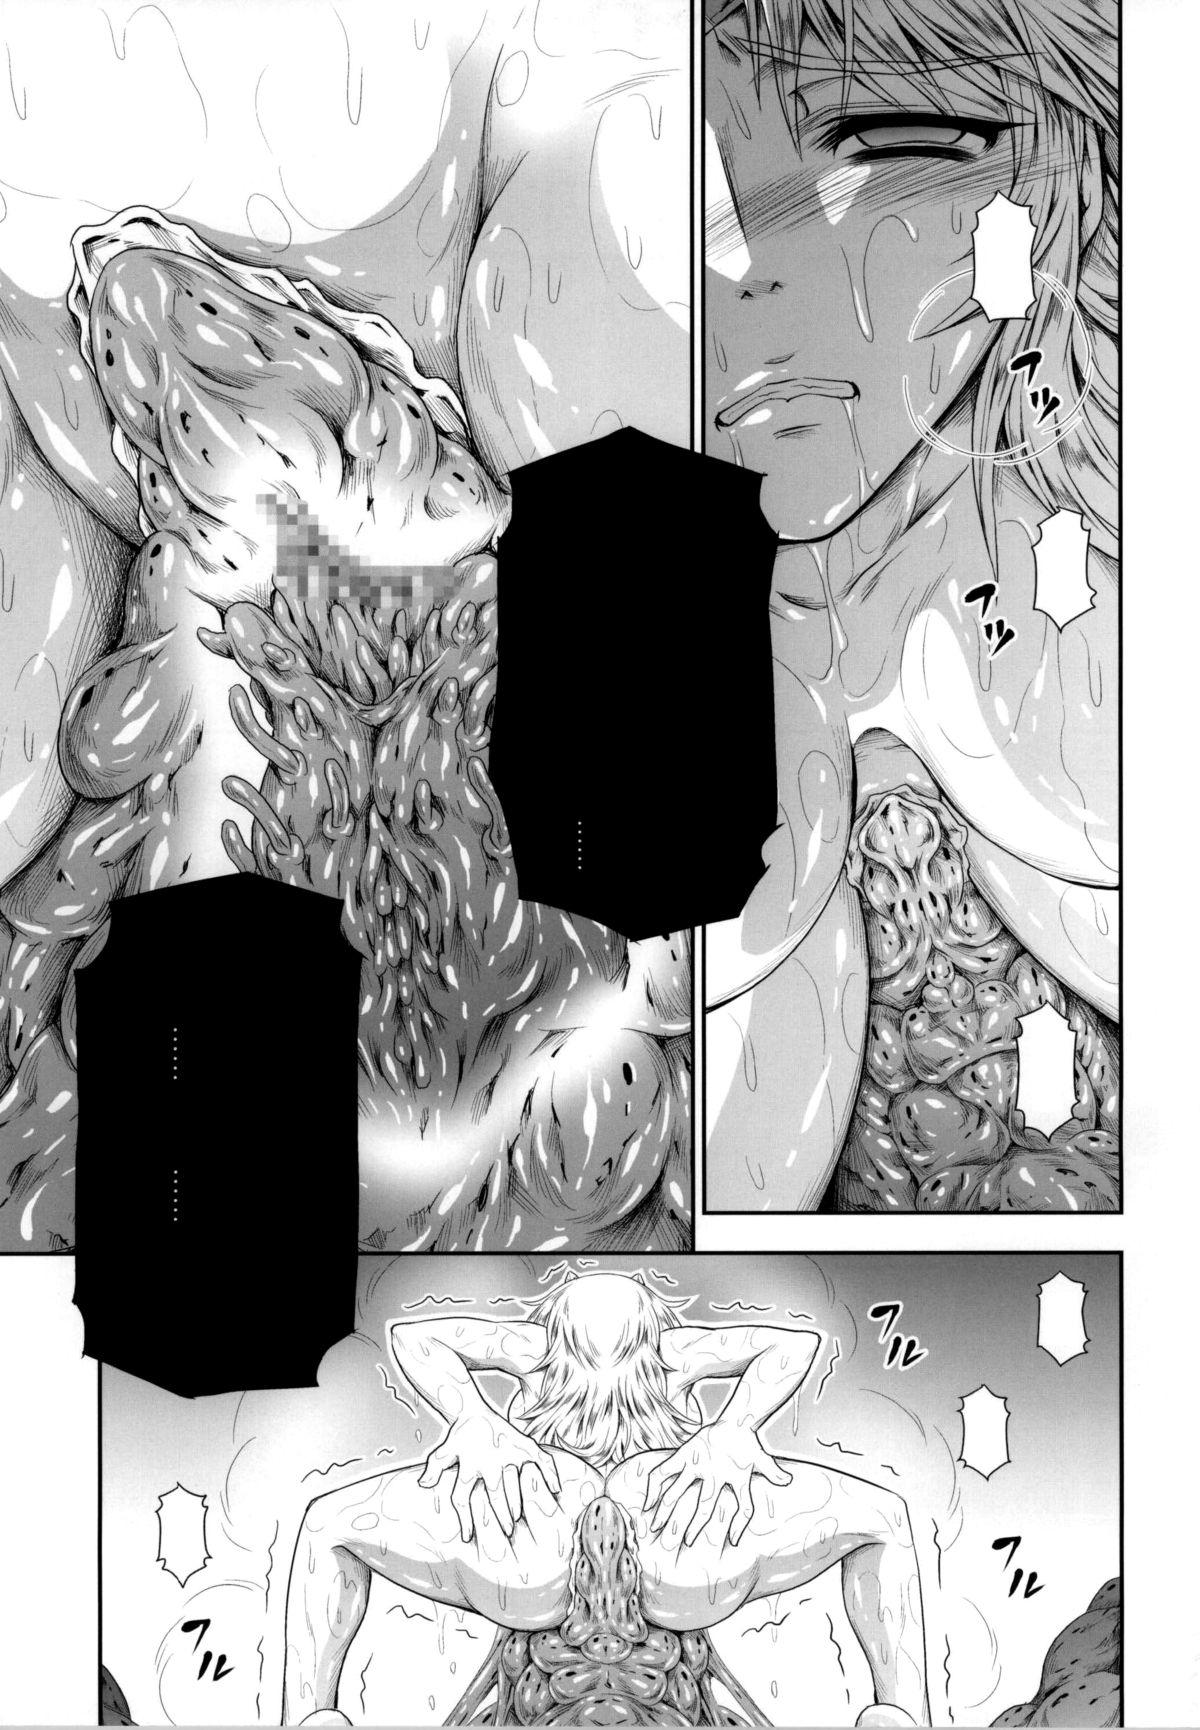 Solo Hunter no Seitai 4 The third part 22